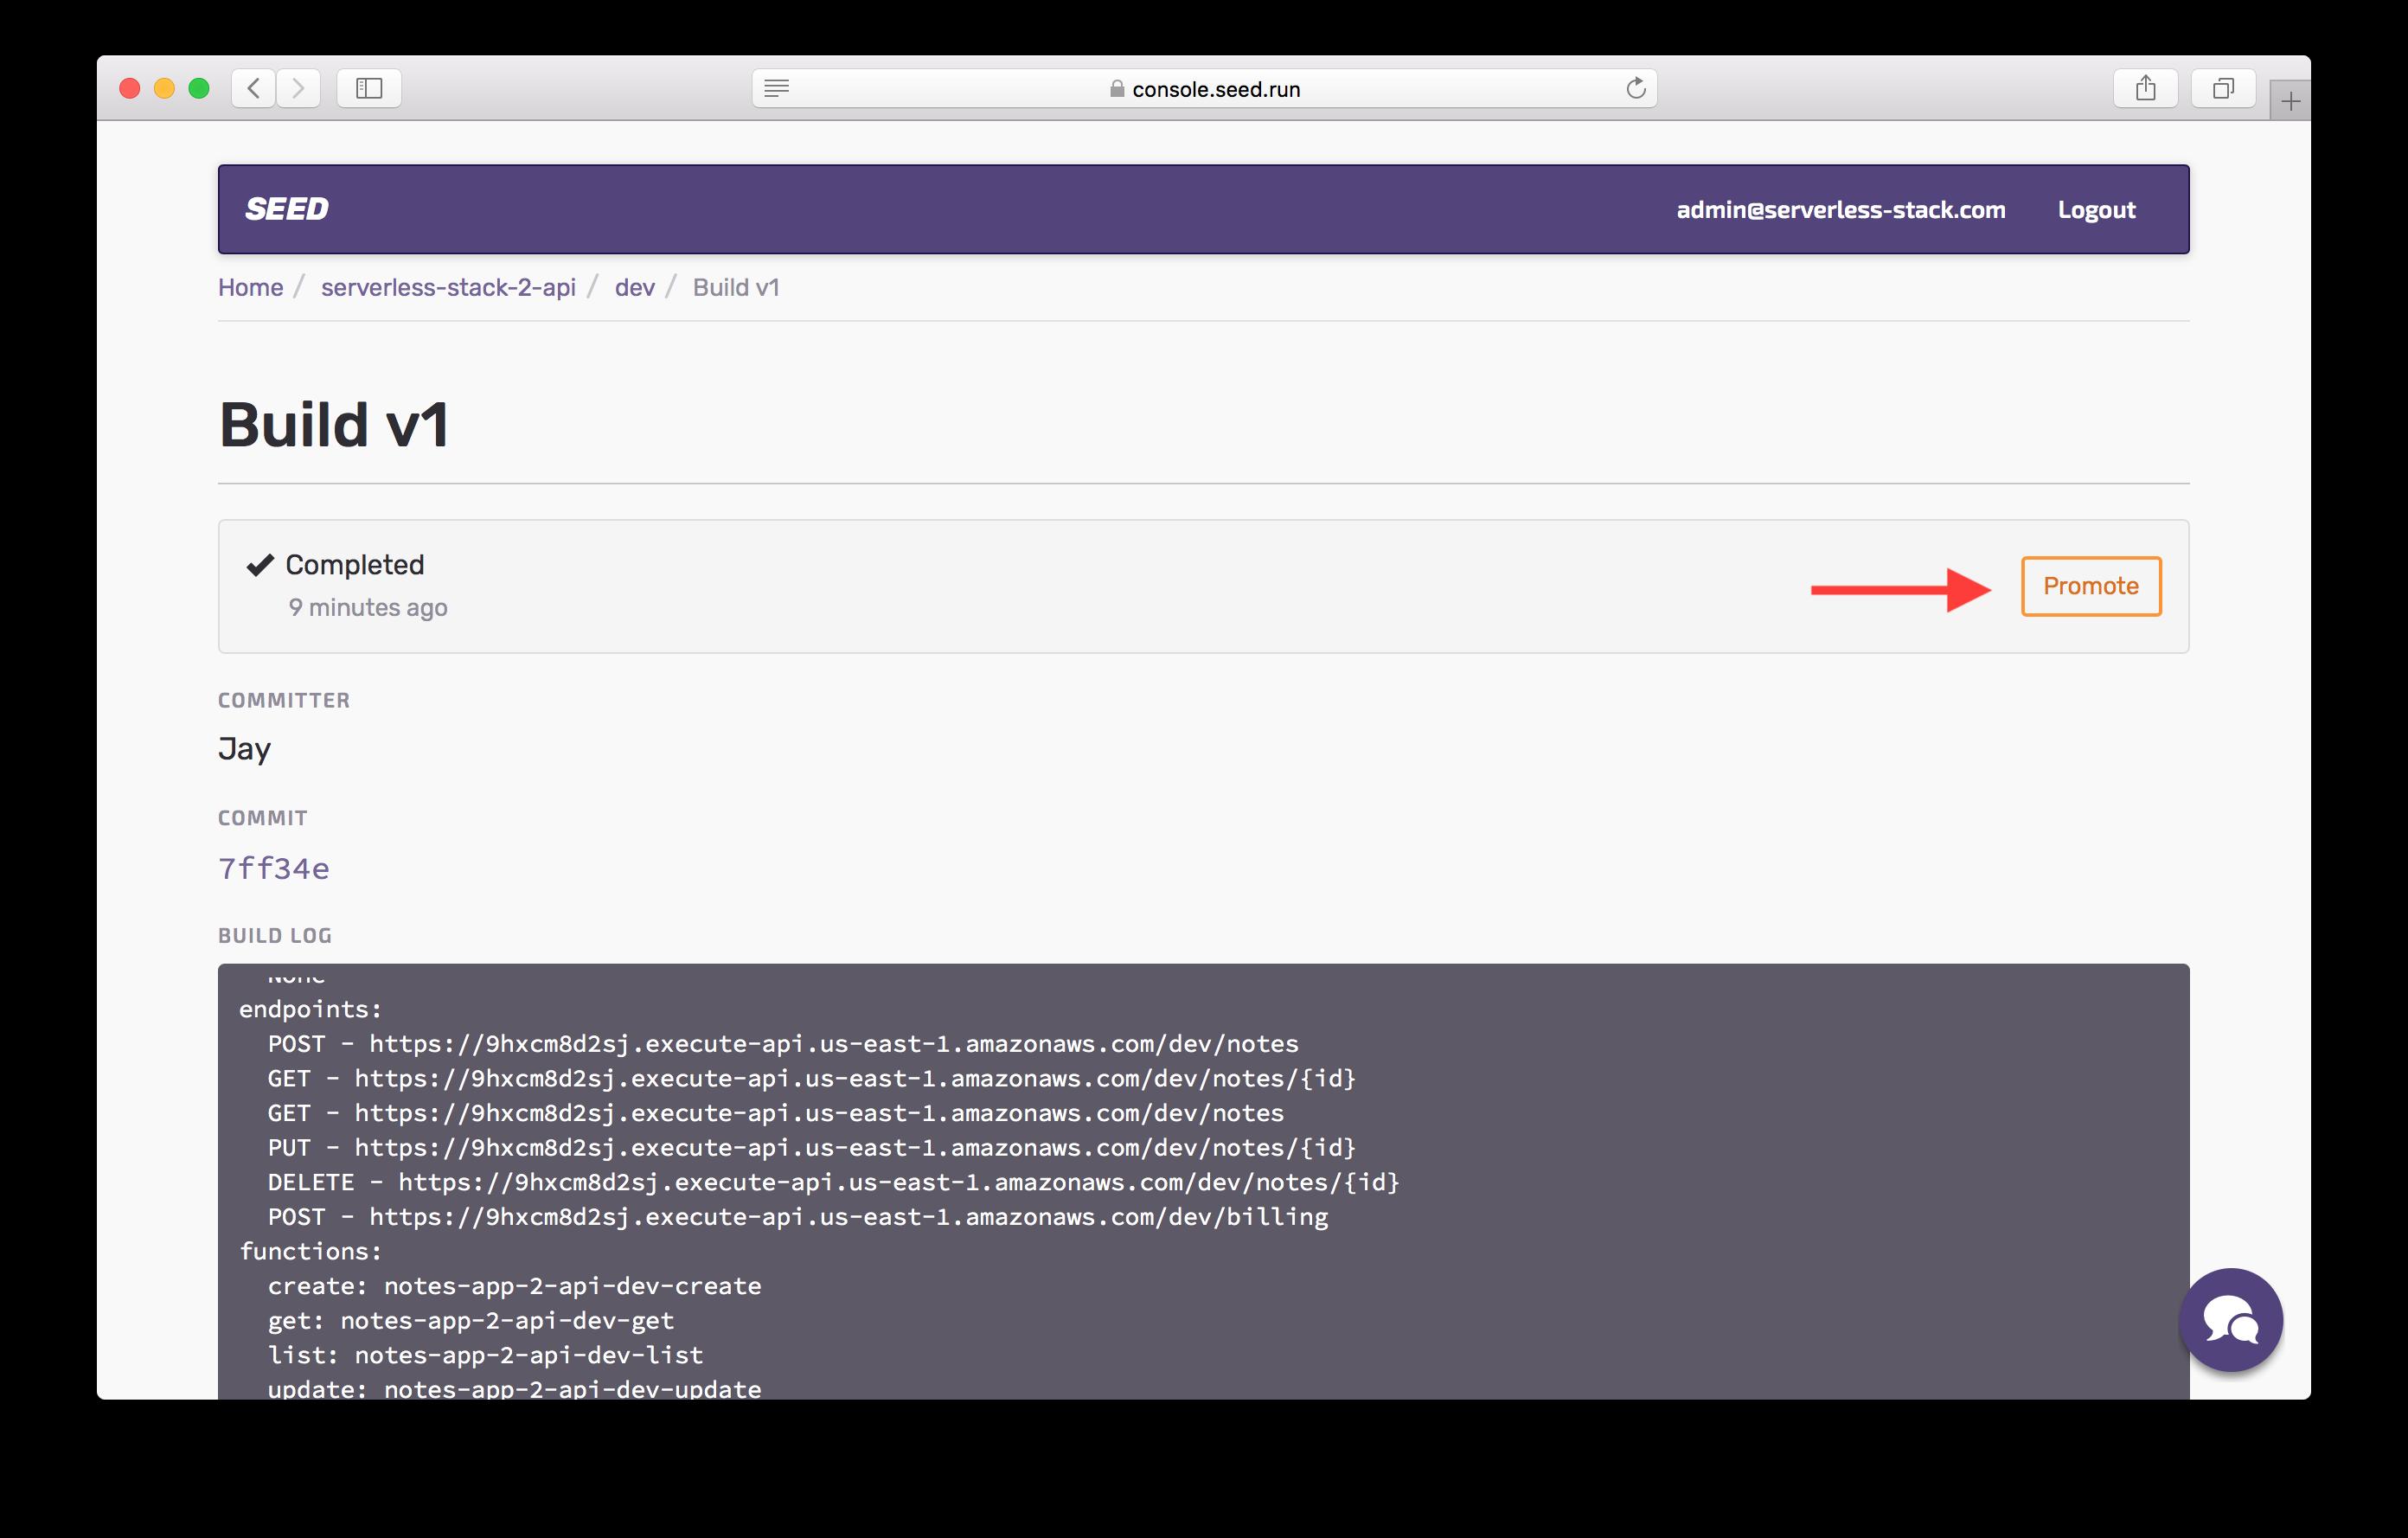 Promote dev build screenshot